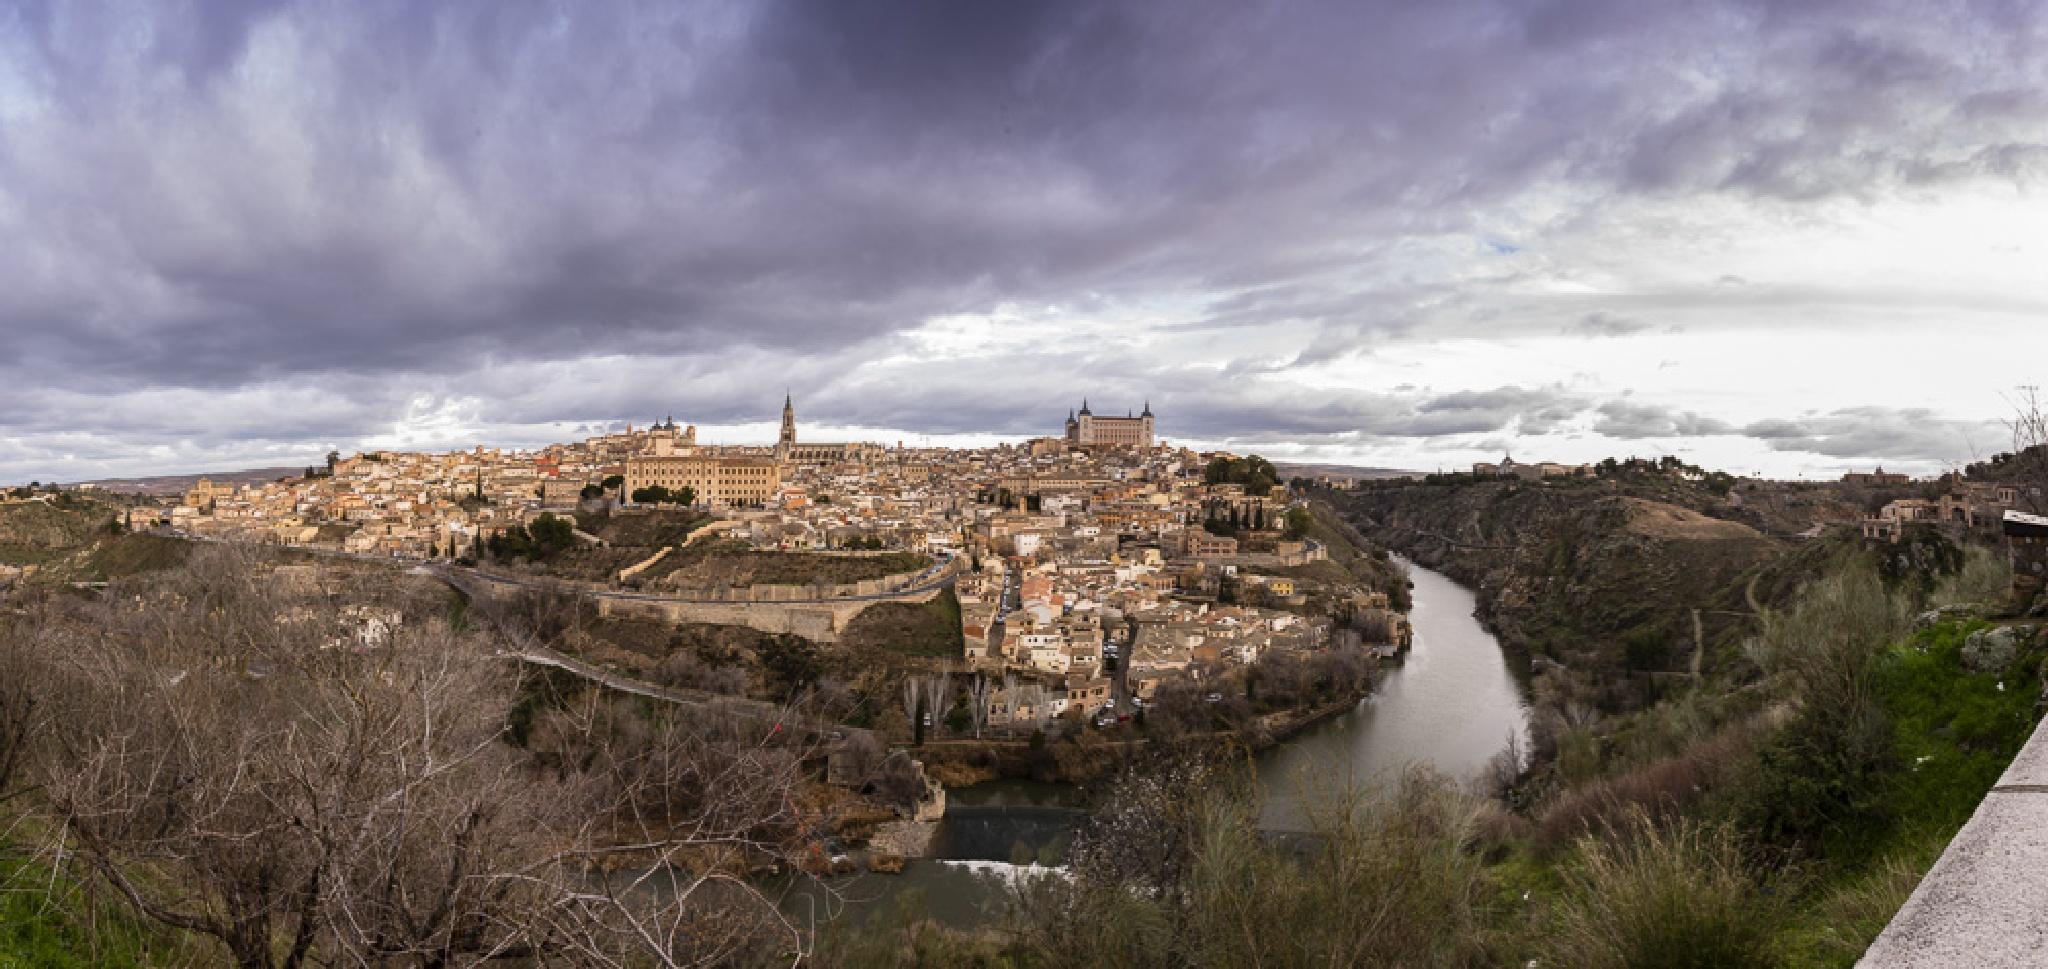 Toledo by VicenteEstebanB